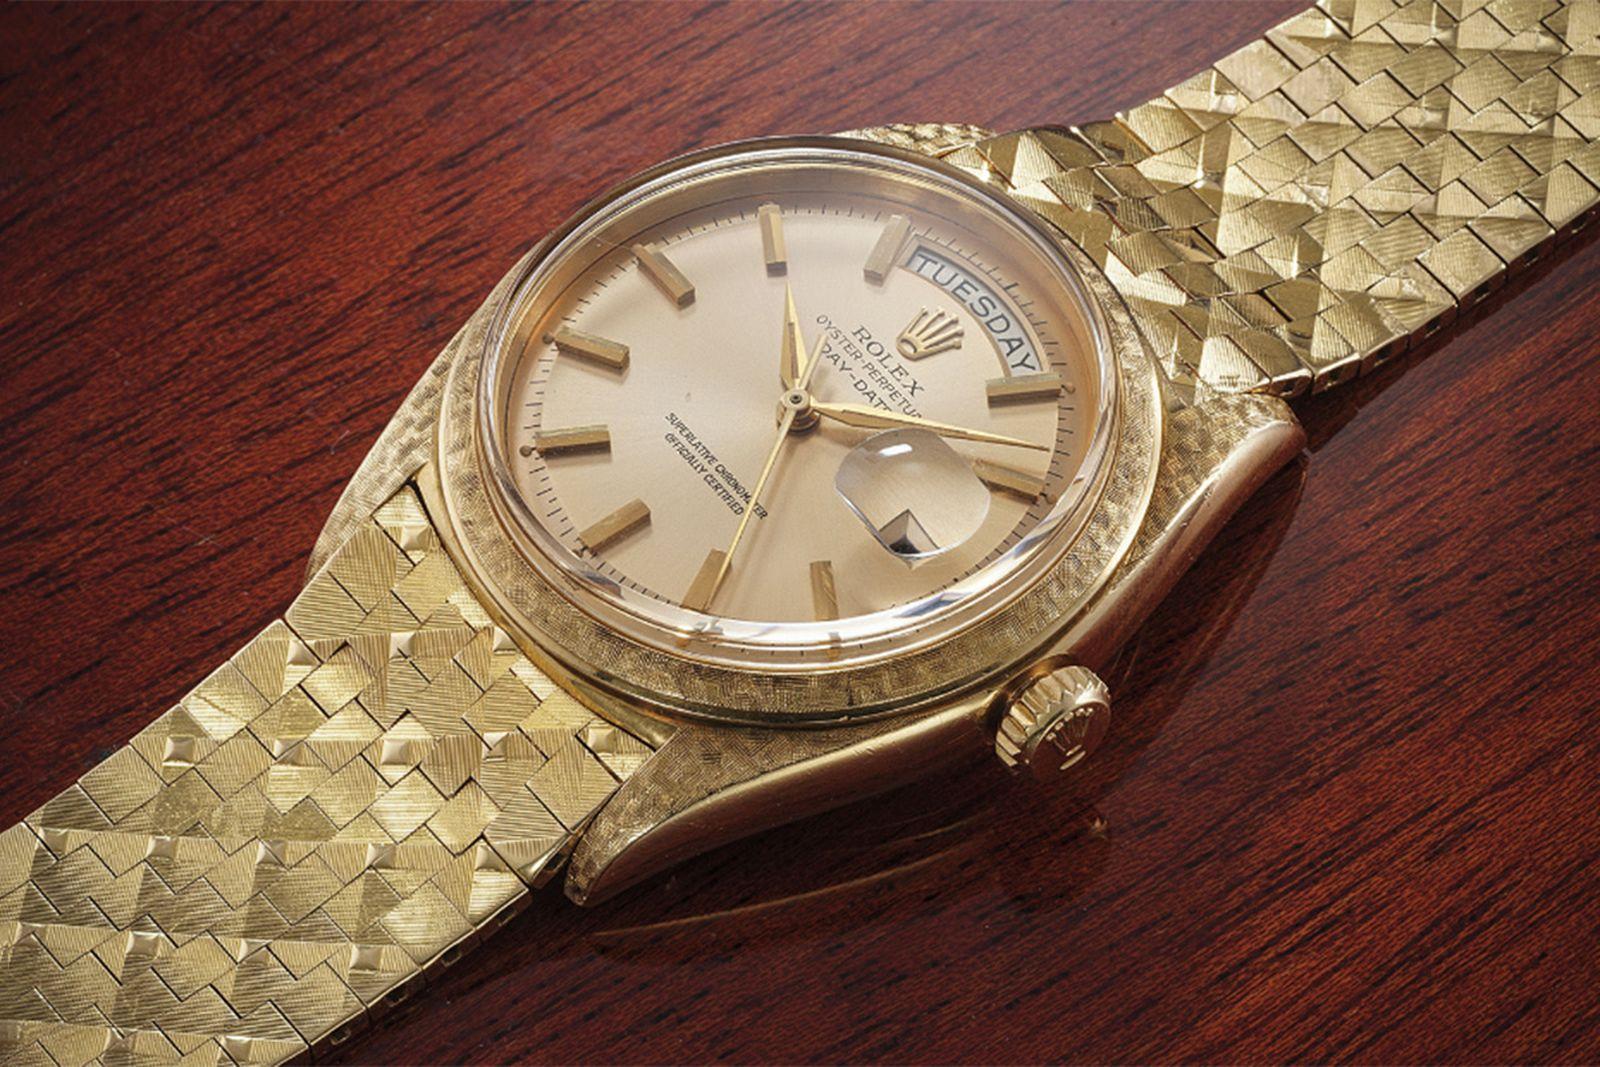 phillips-geneva-watch-auction-xiii-08